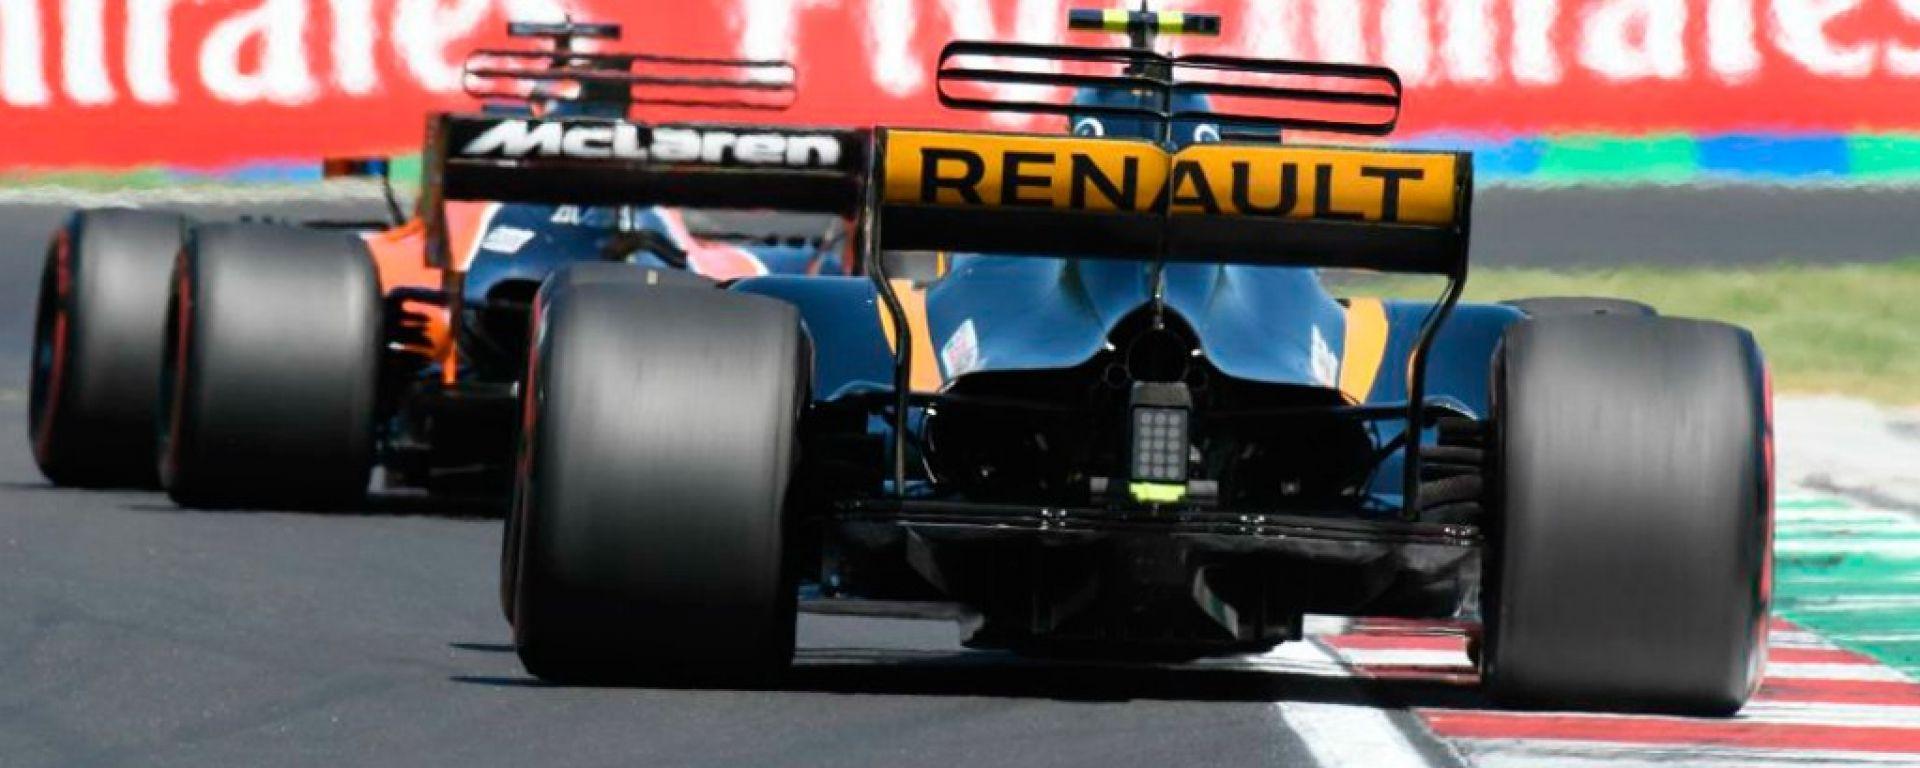 McLaren passerà con la Renault dal 2018